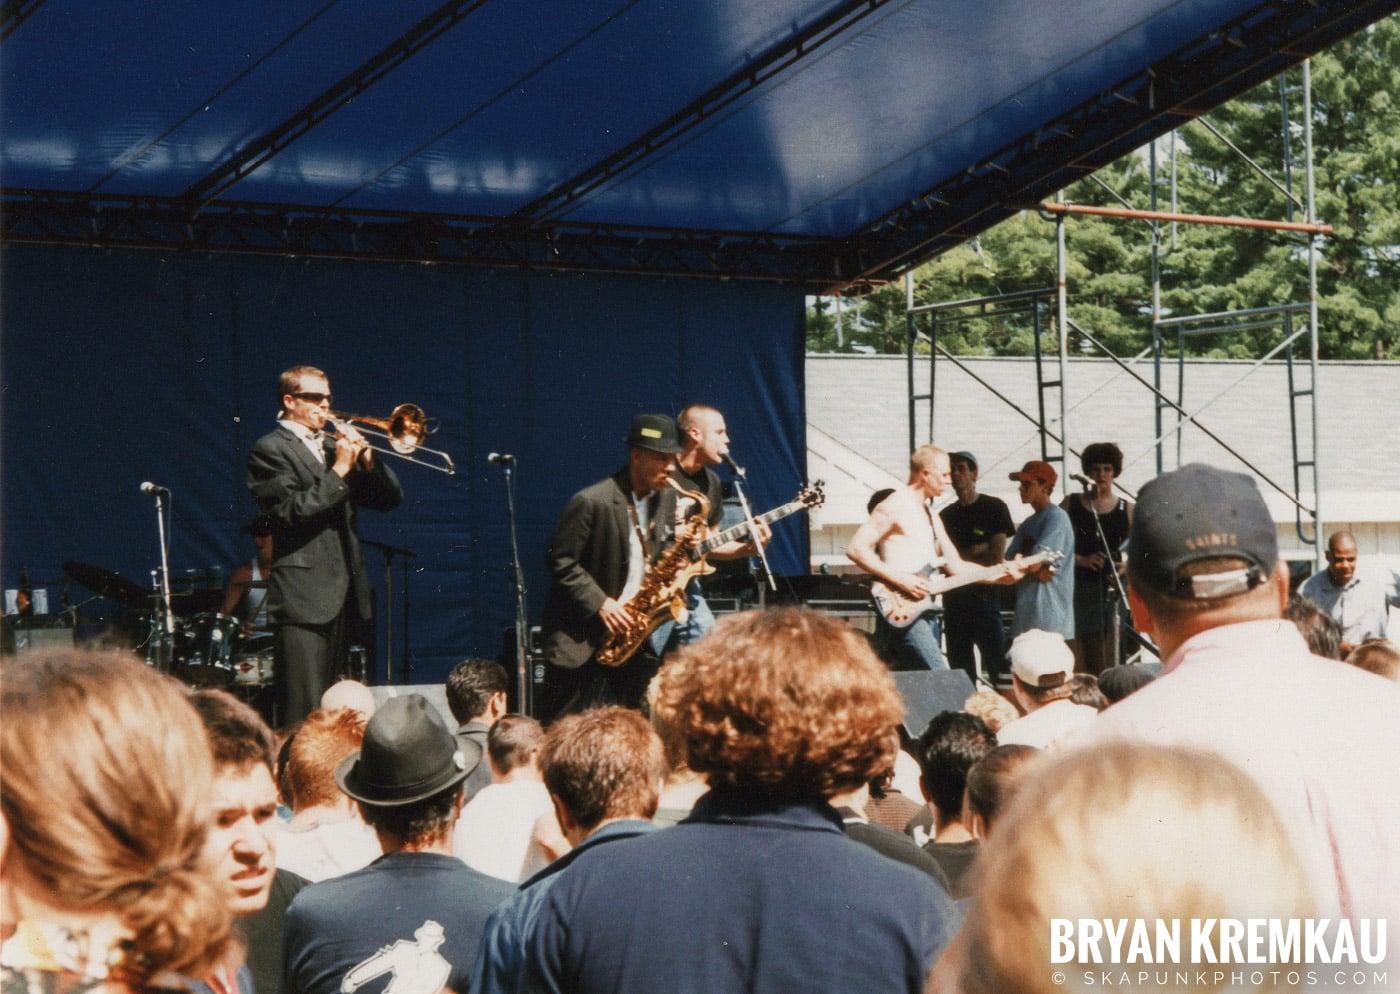 The Skoidats @ New England Ska Fest 98, Westford, MA - 8.22.98 (1)